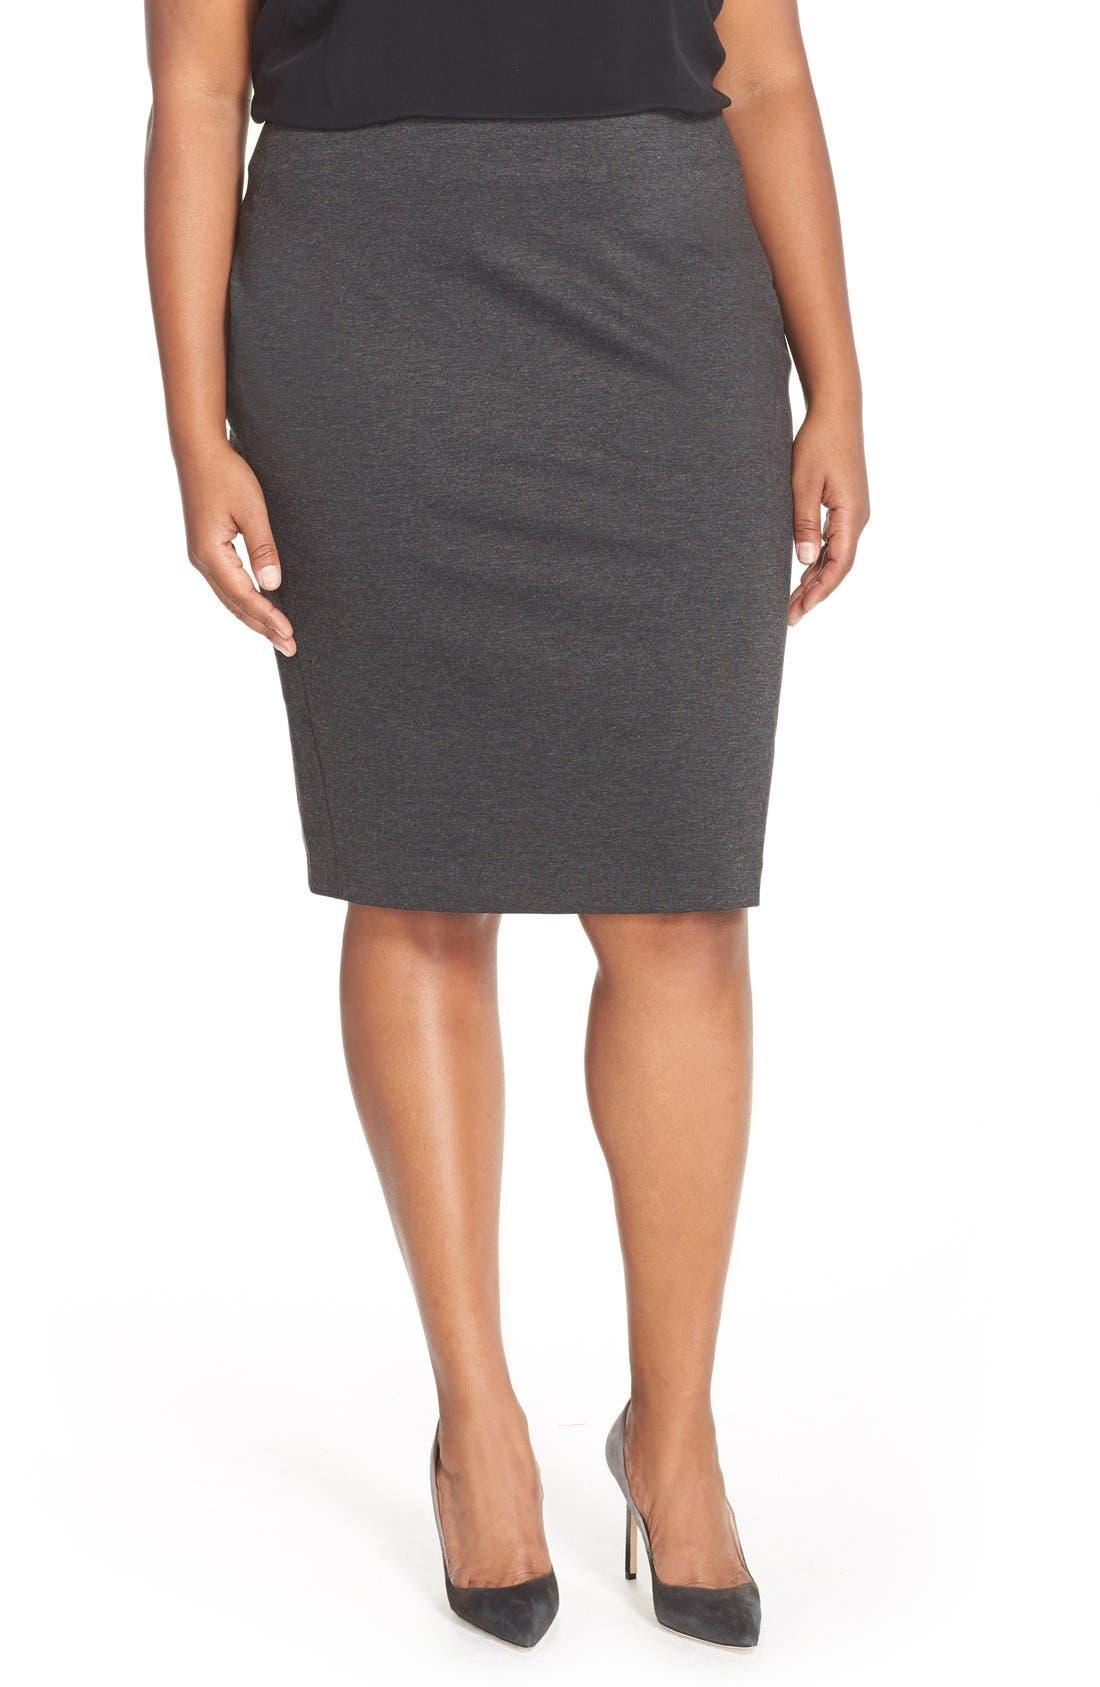 Main Image - Vince Camuto Ponte Knit Skirt (Plus Size)